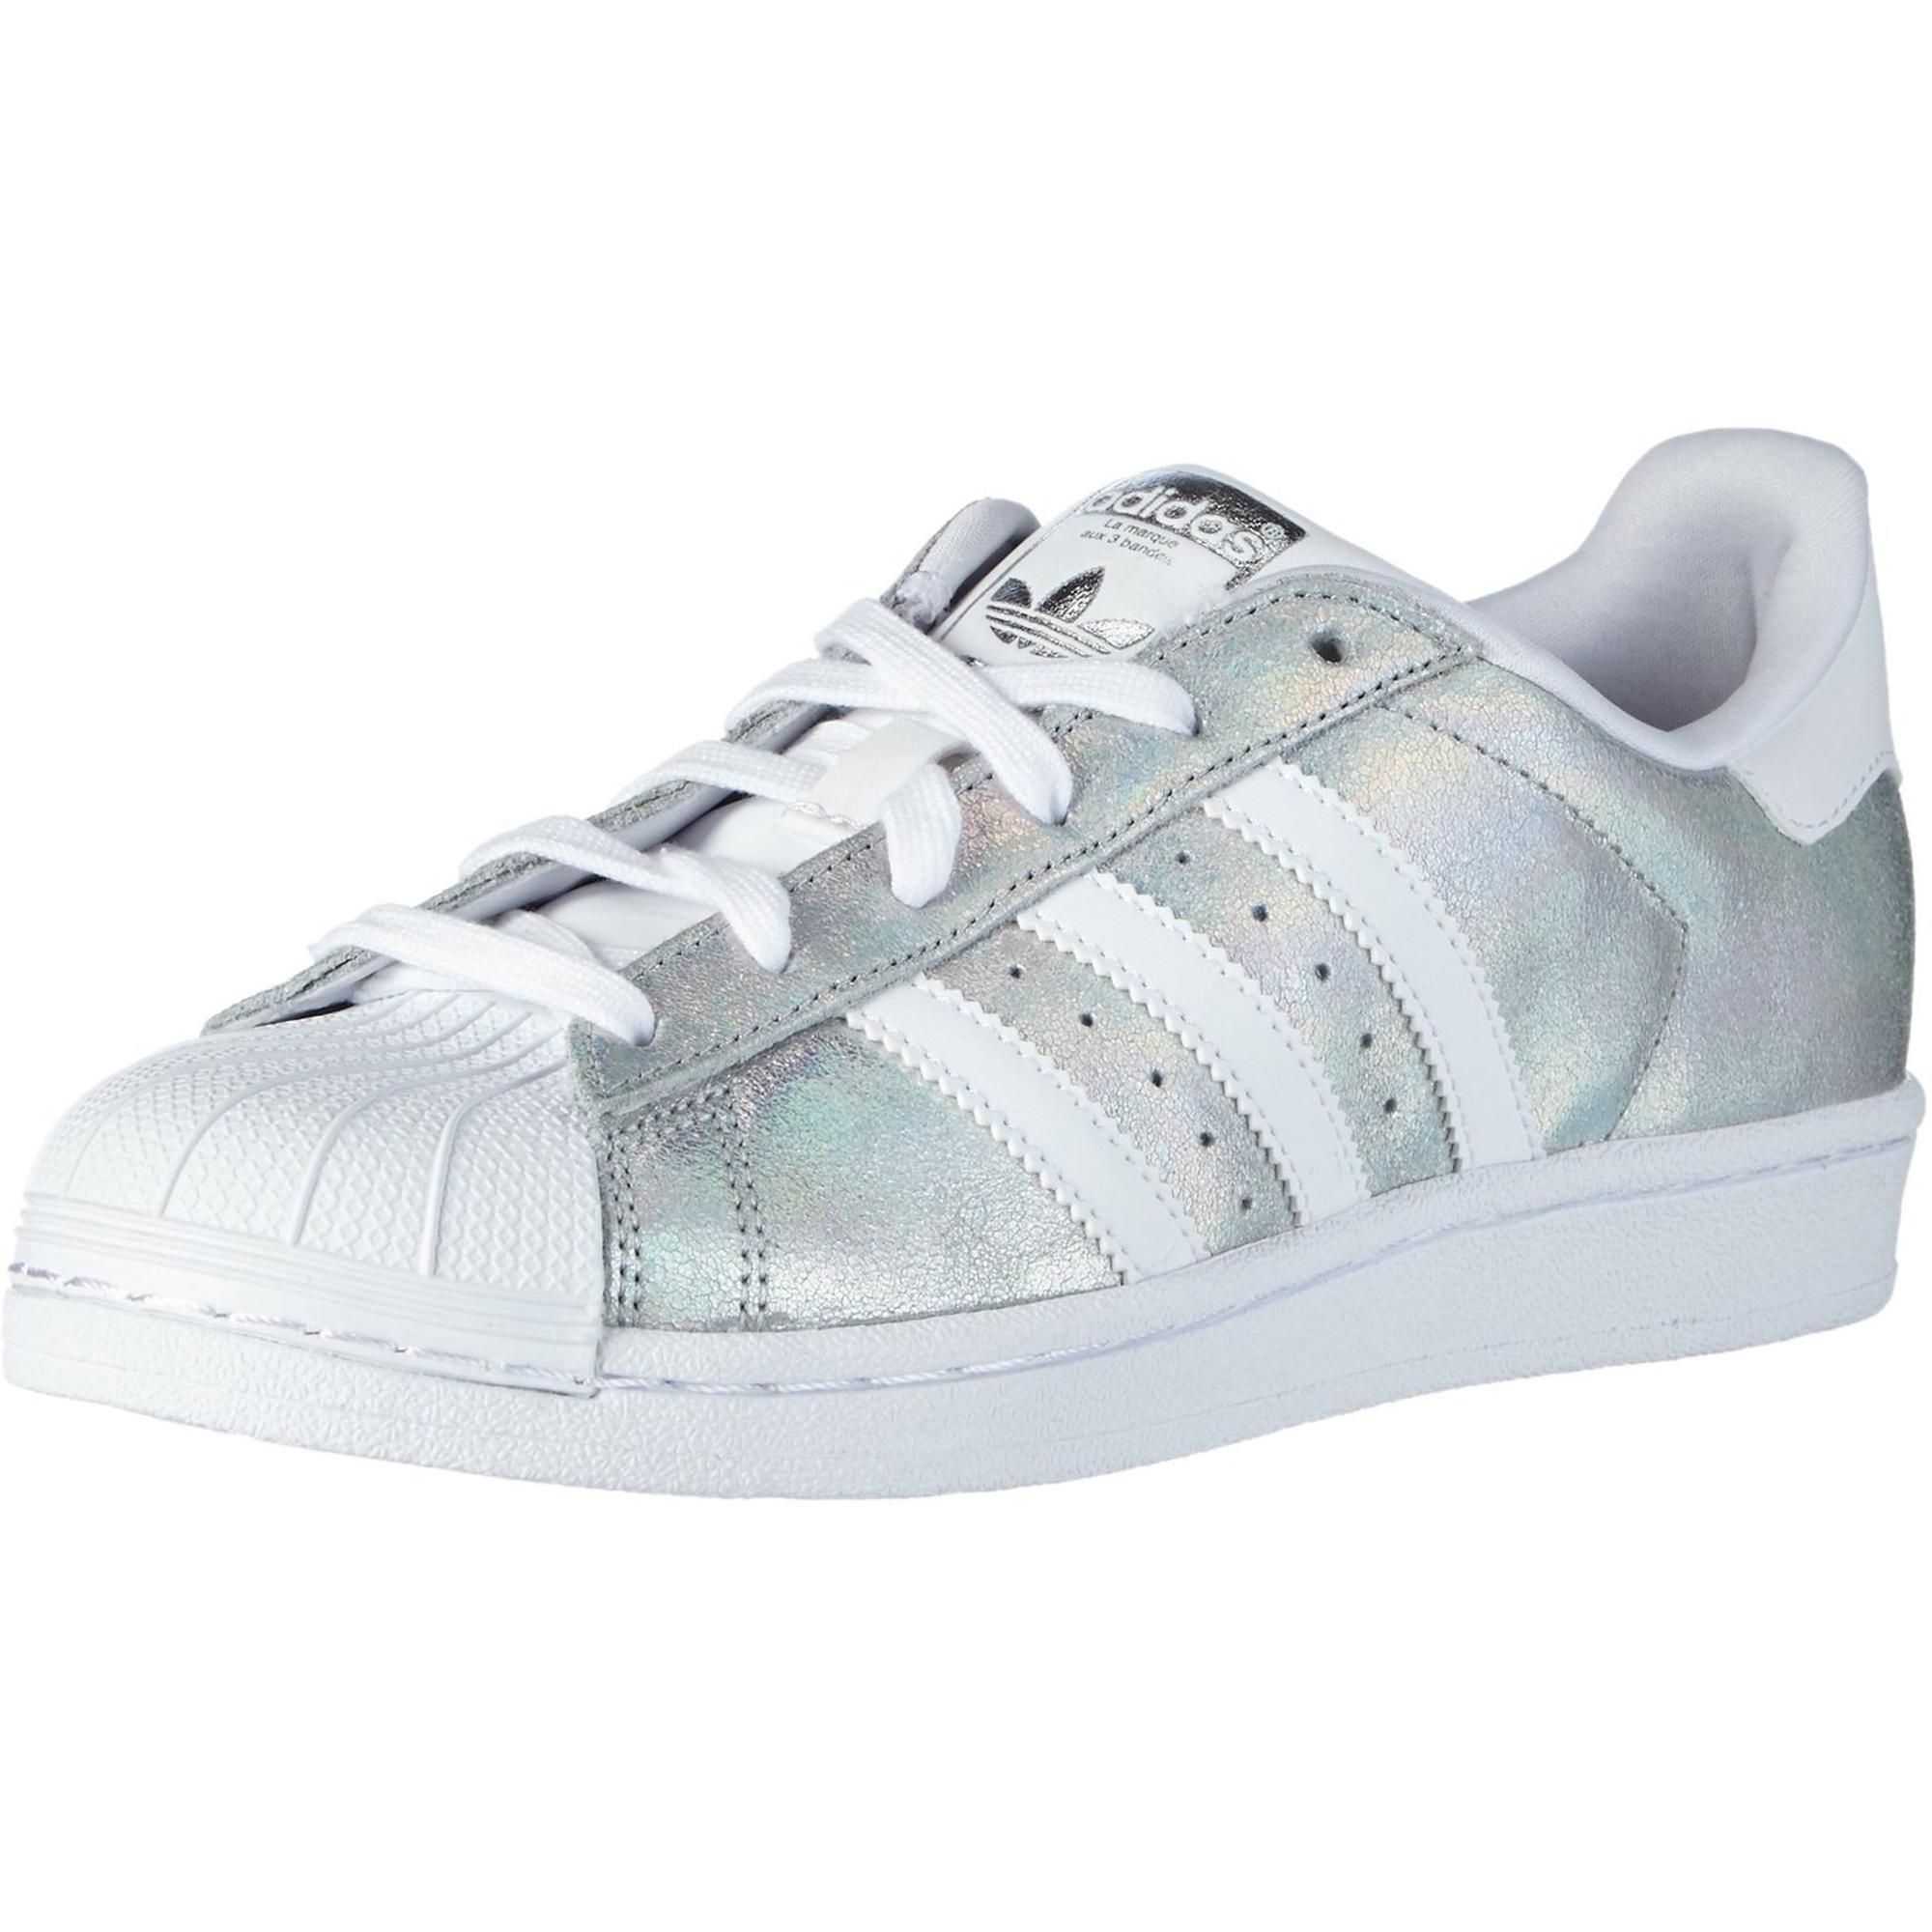 Erwachsene Silber Superstar Leder adidas Originals clJ3K1TF